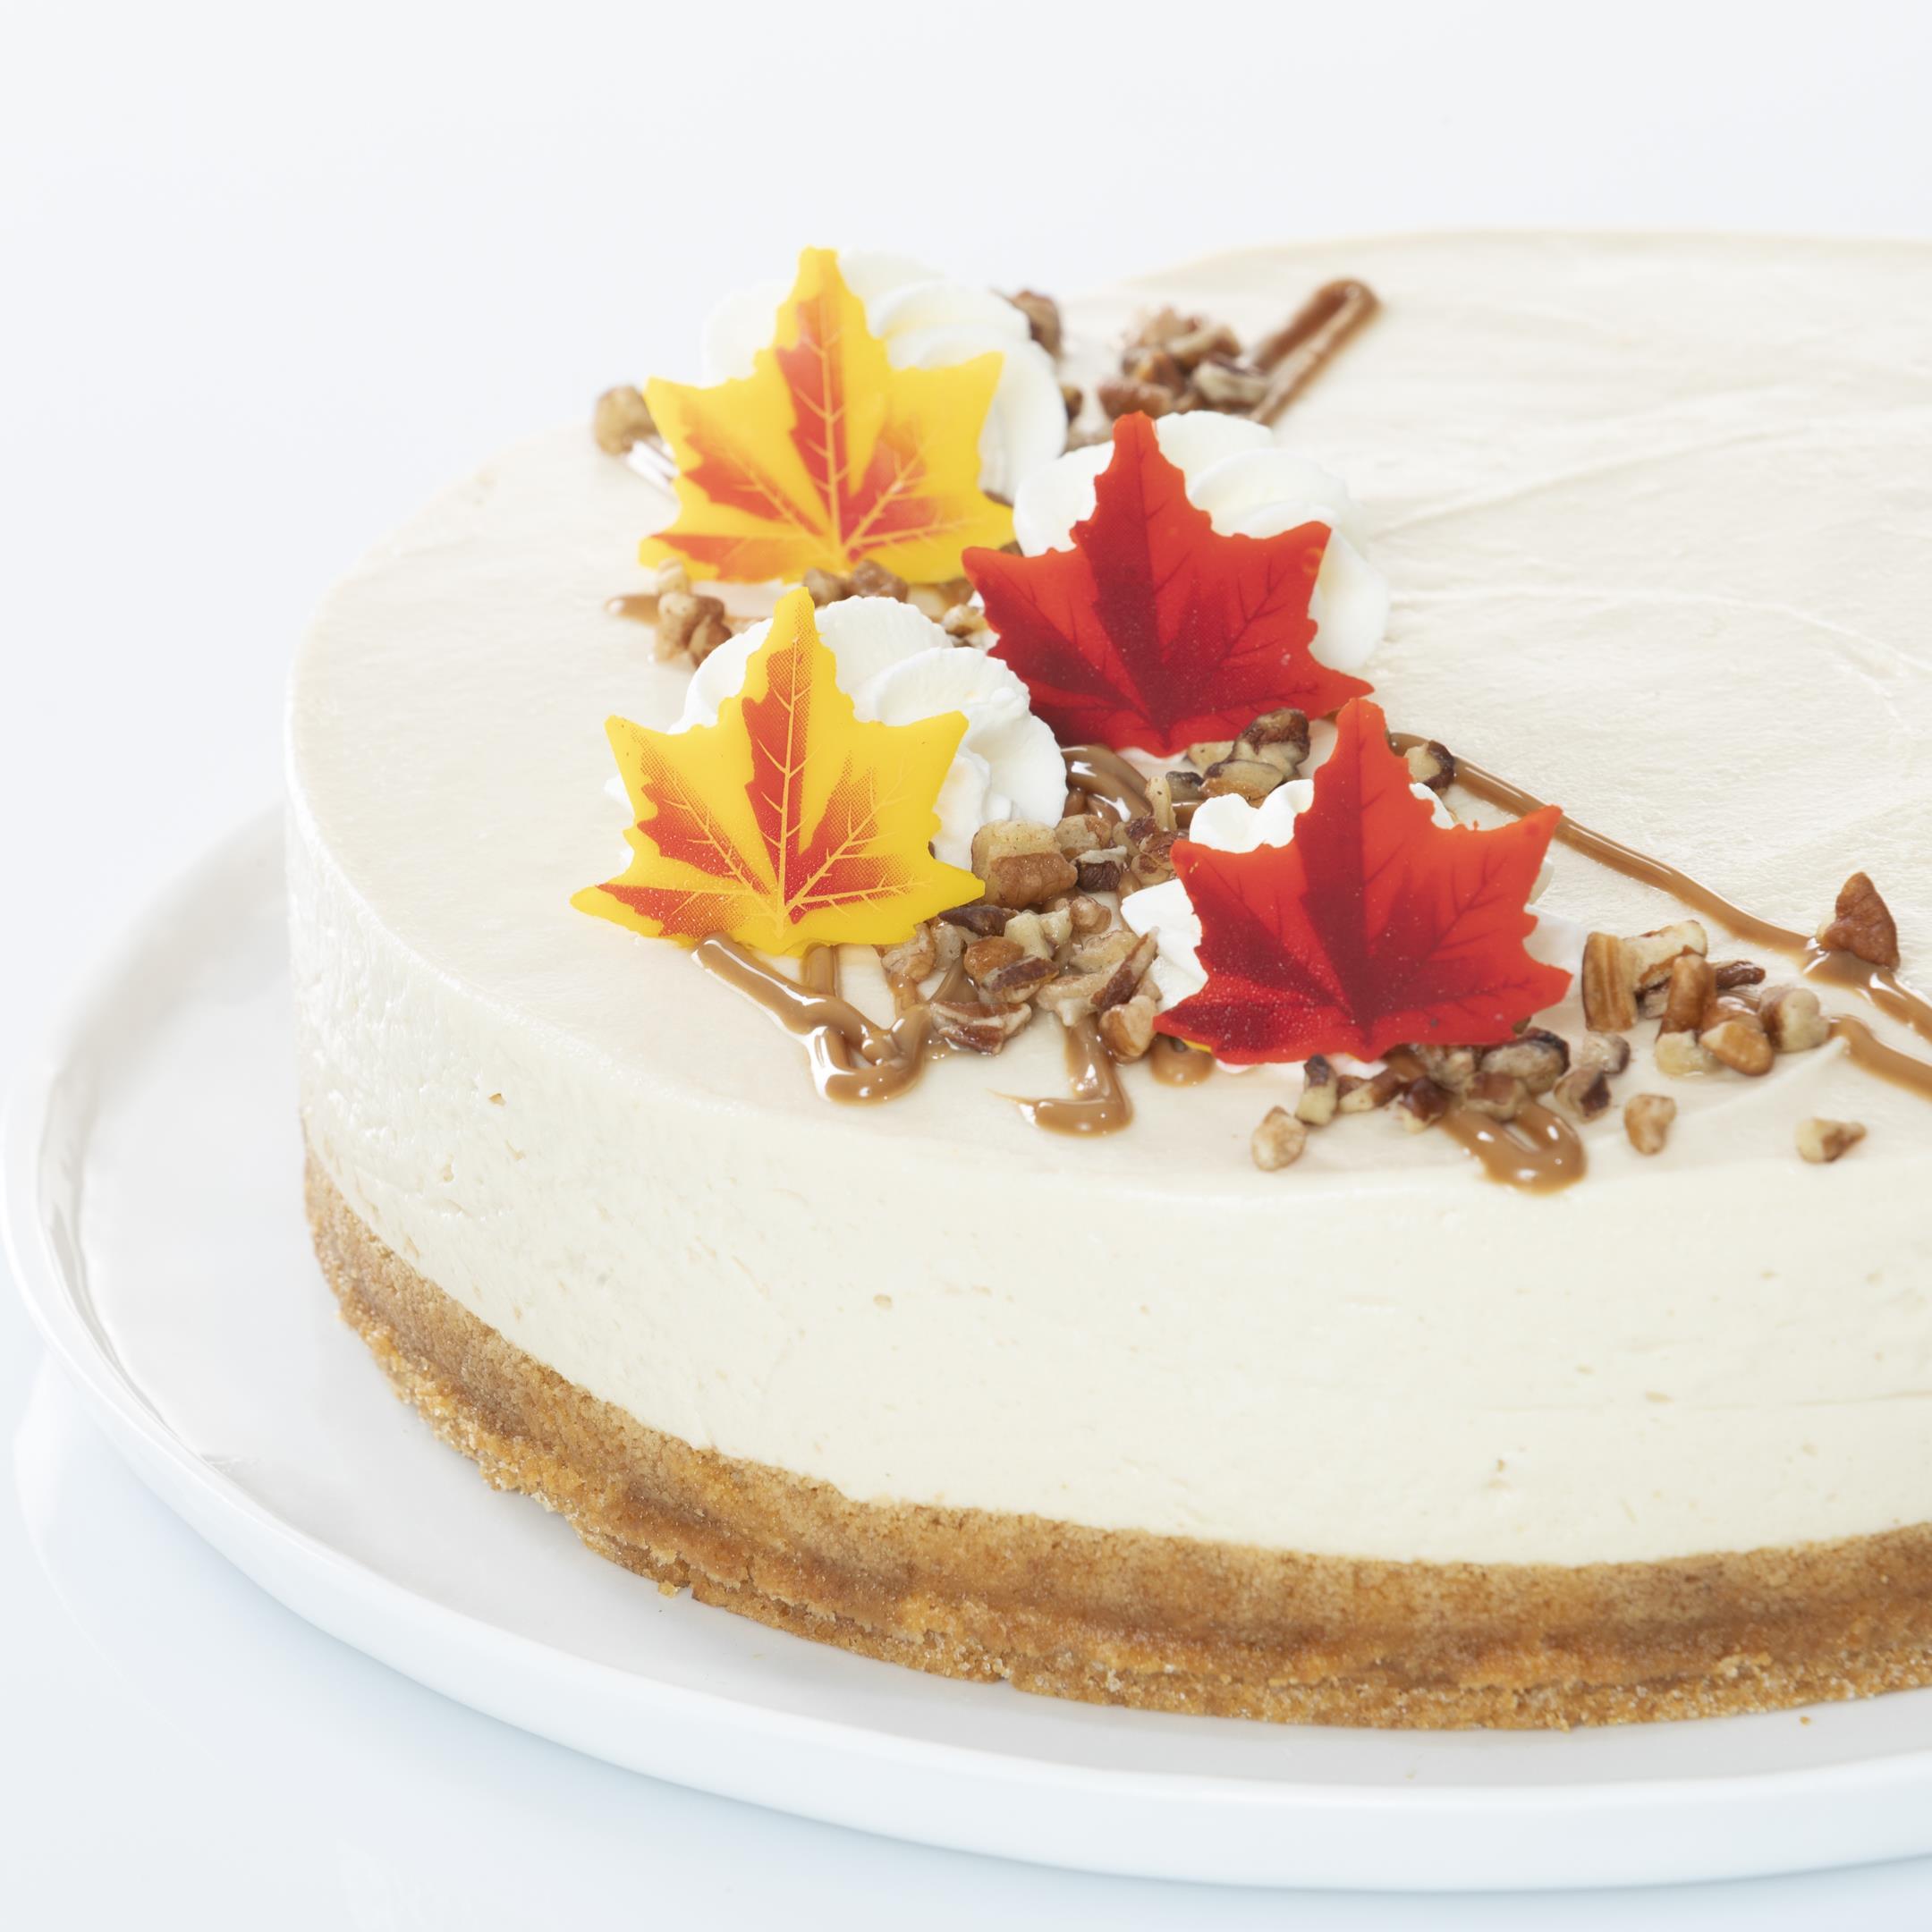 Caramel Crunch Cheesecake